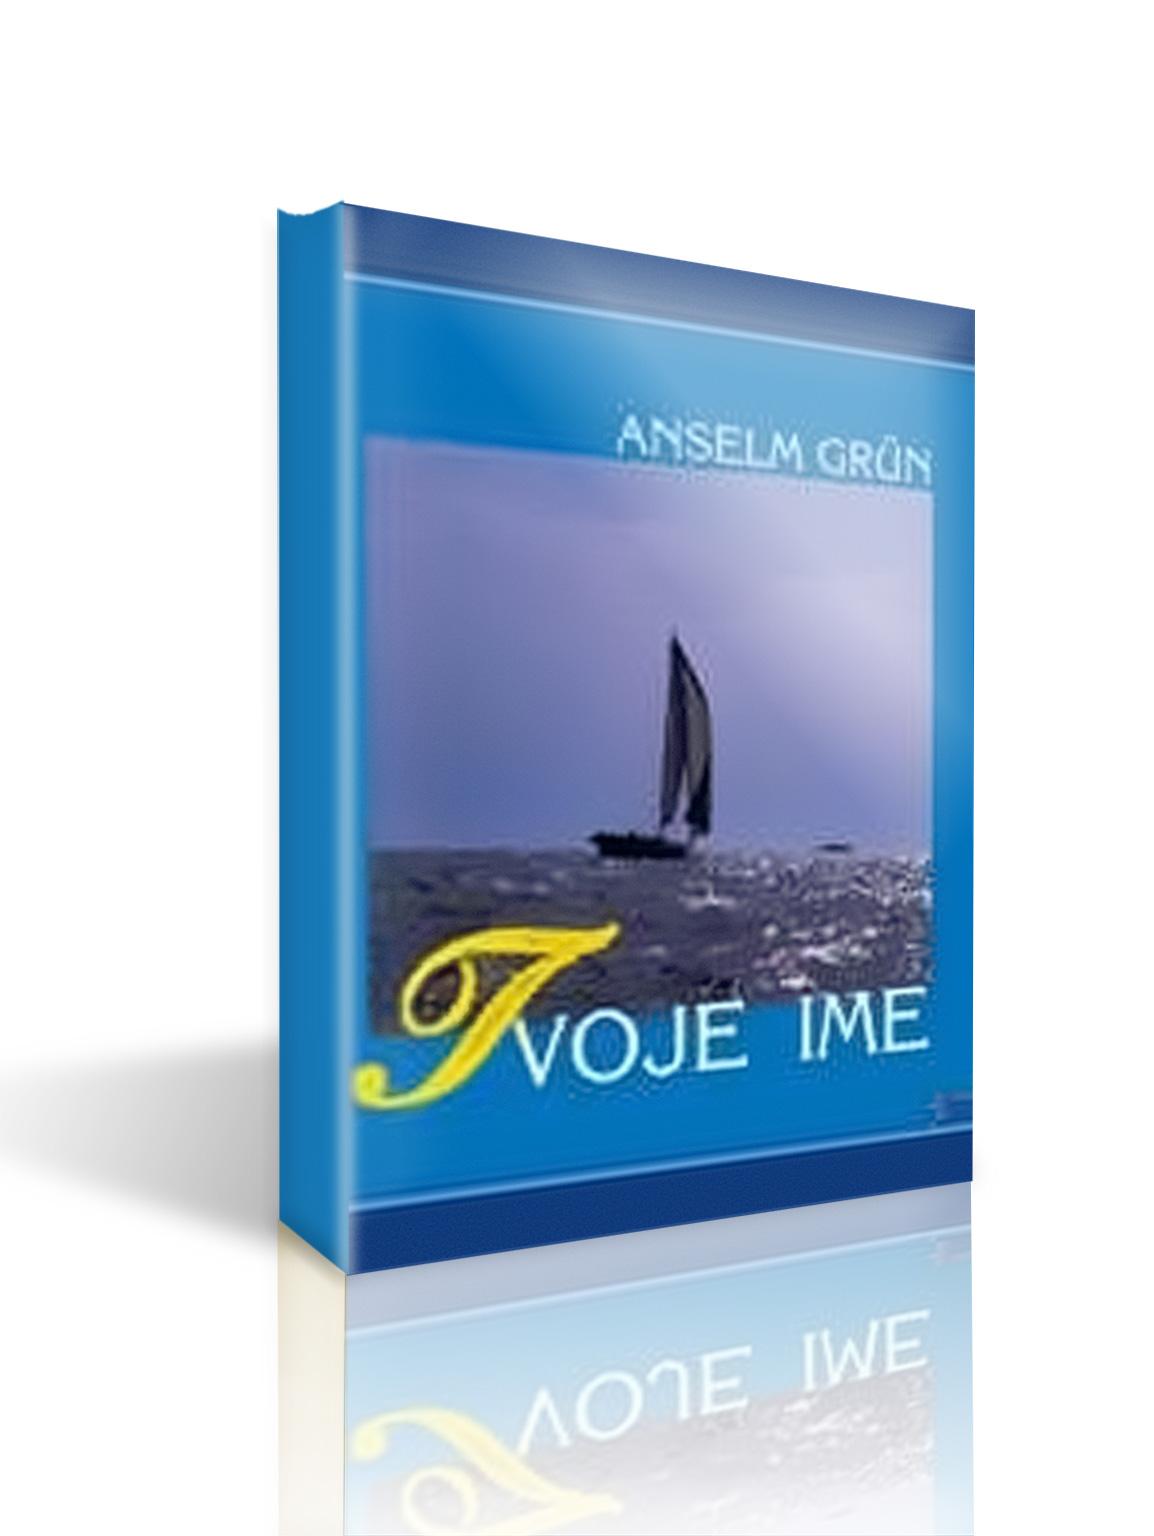 TVOJE IME - Anselm Grün